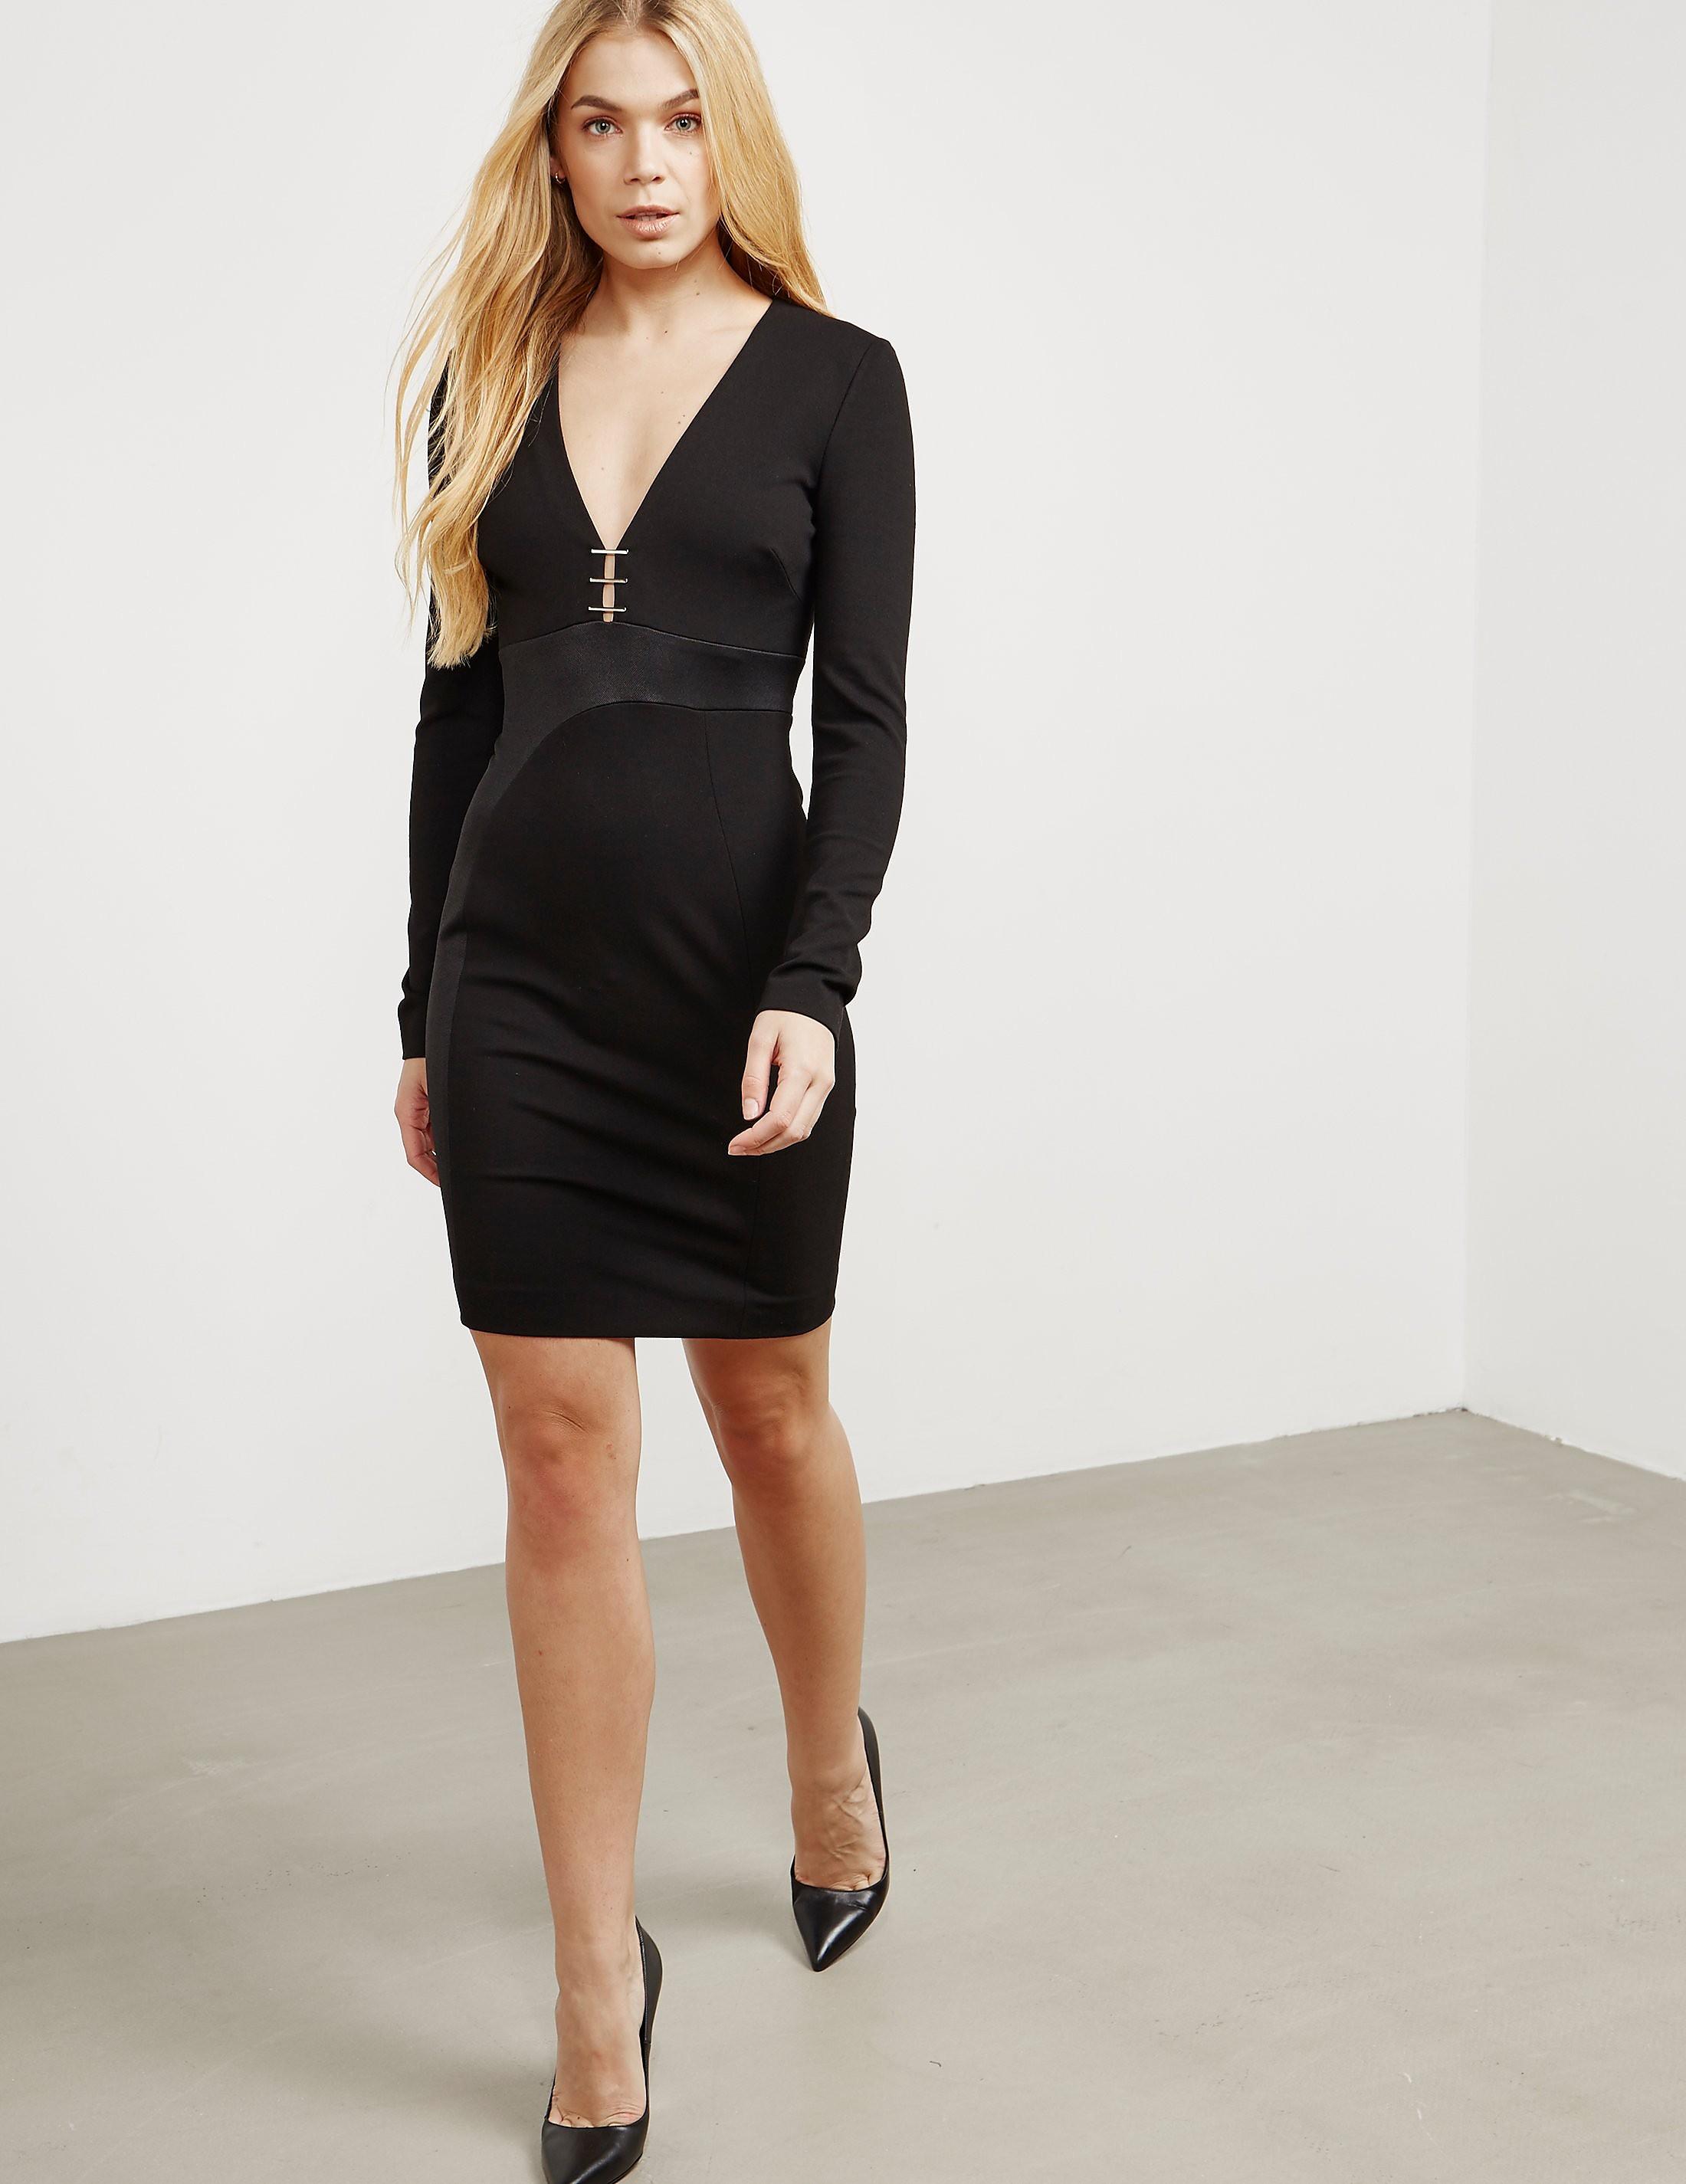 Versace Plunge Dress